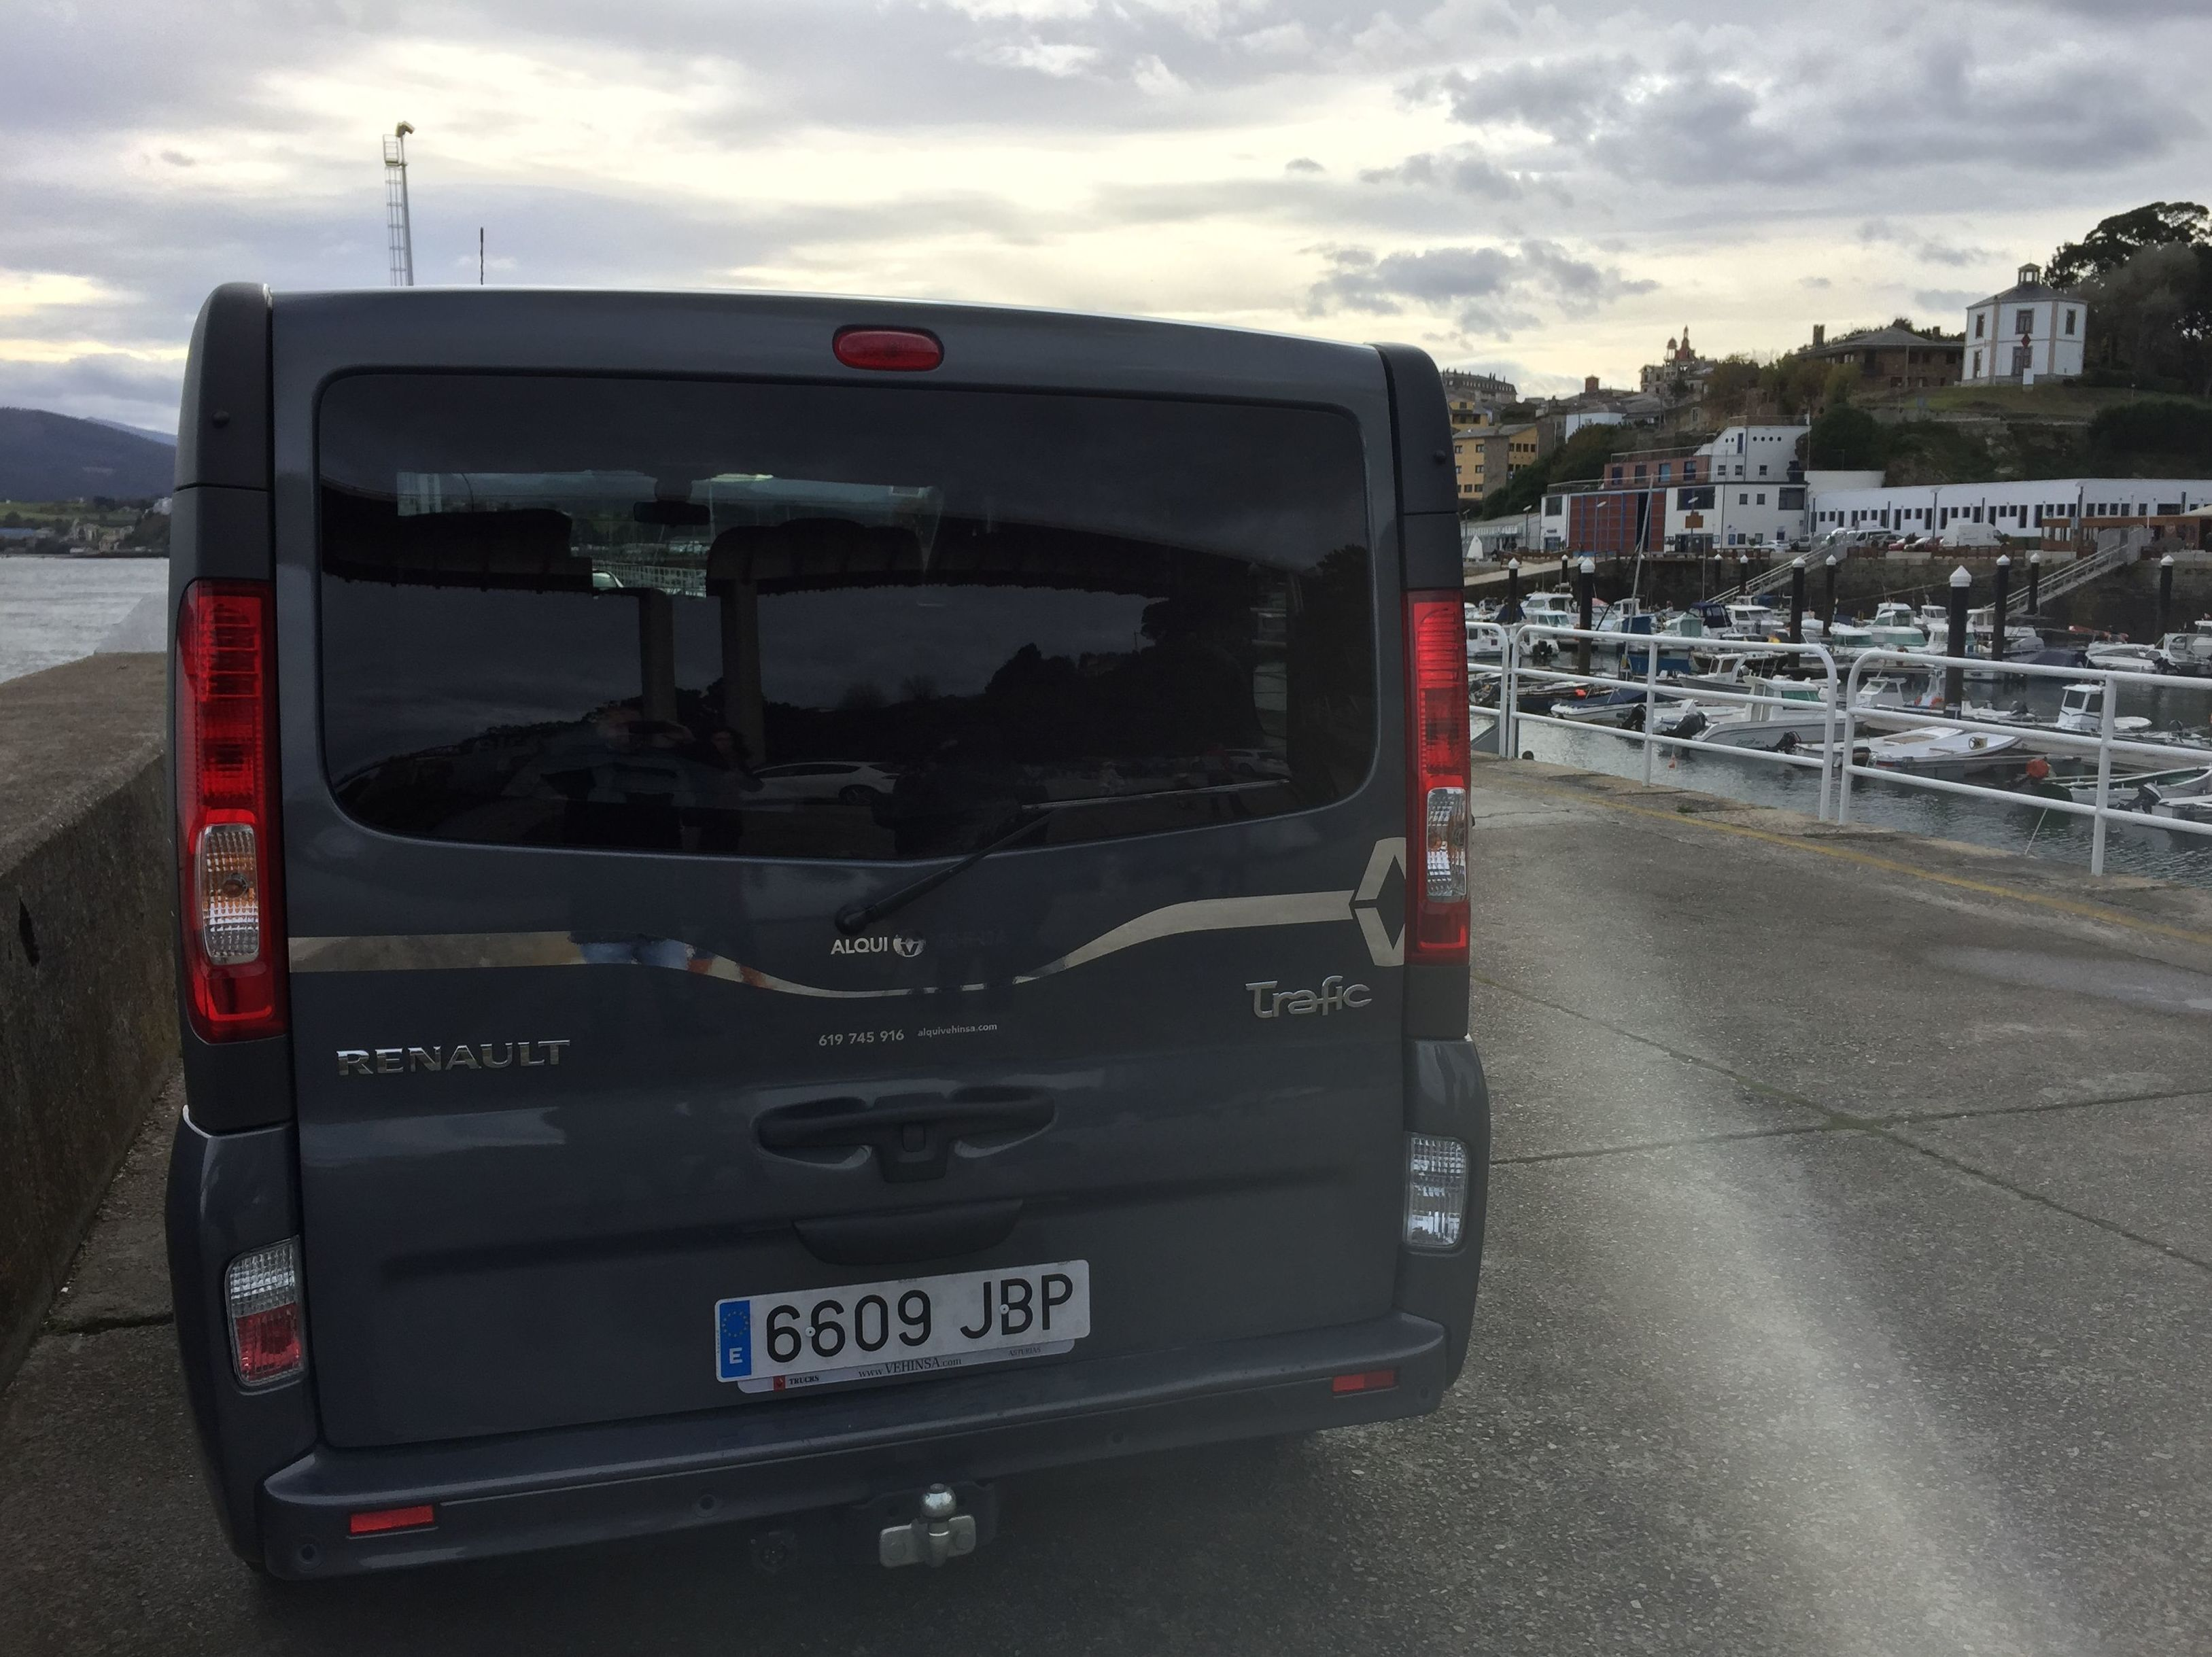 Alquiler vehículos plazas Asturias